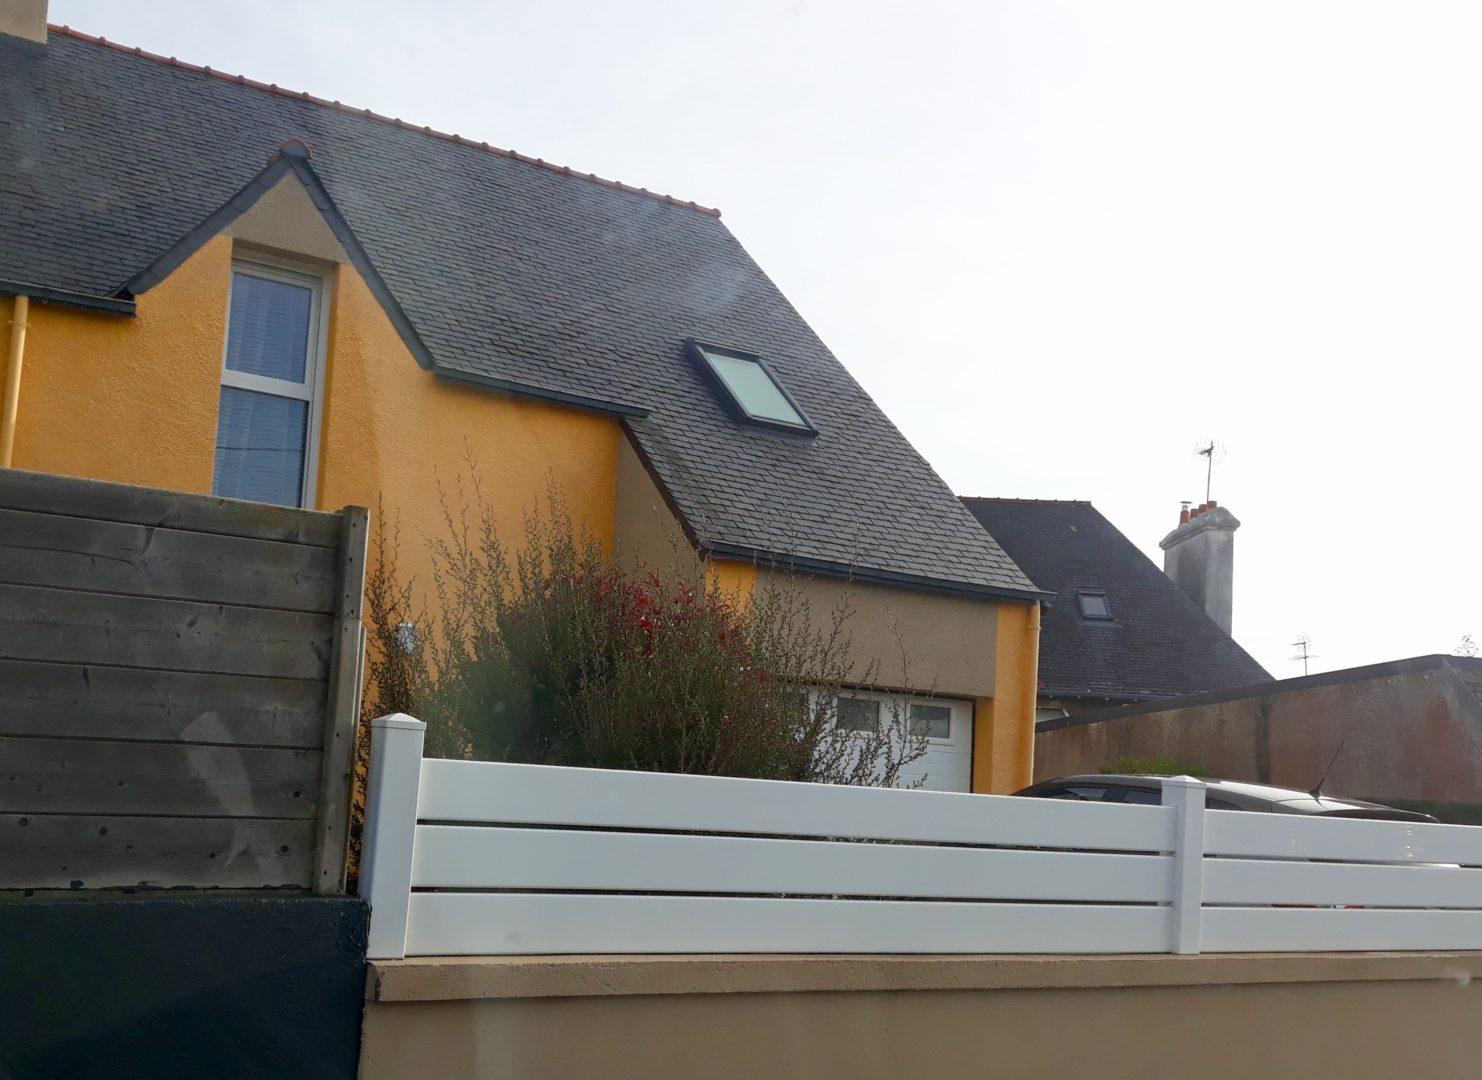 ravalement-facade-maison-2-1